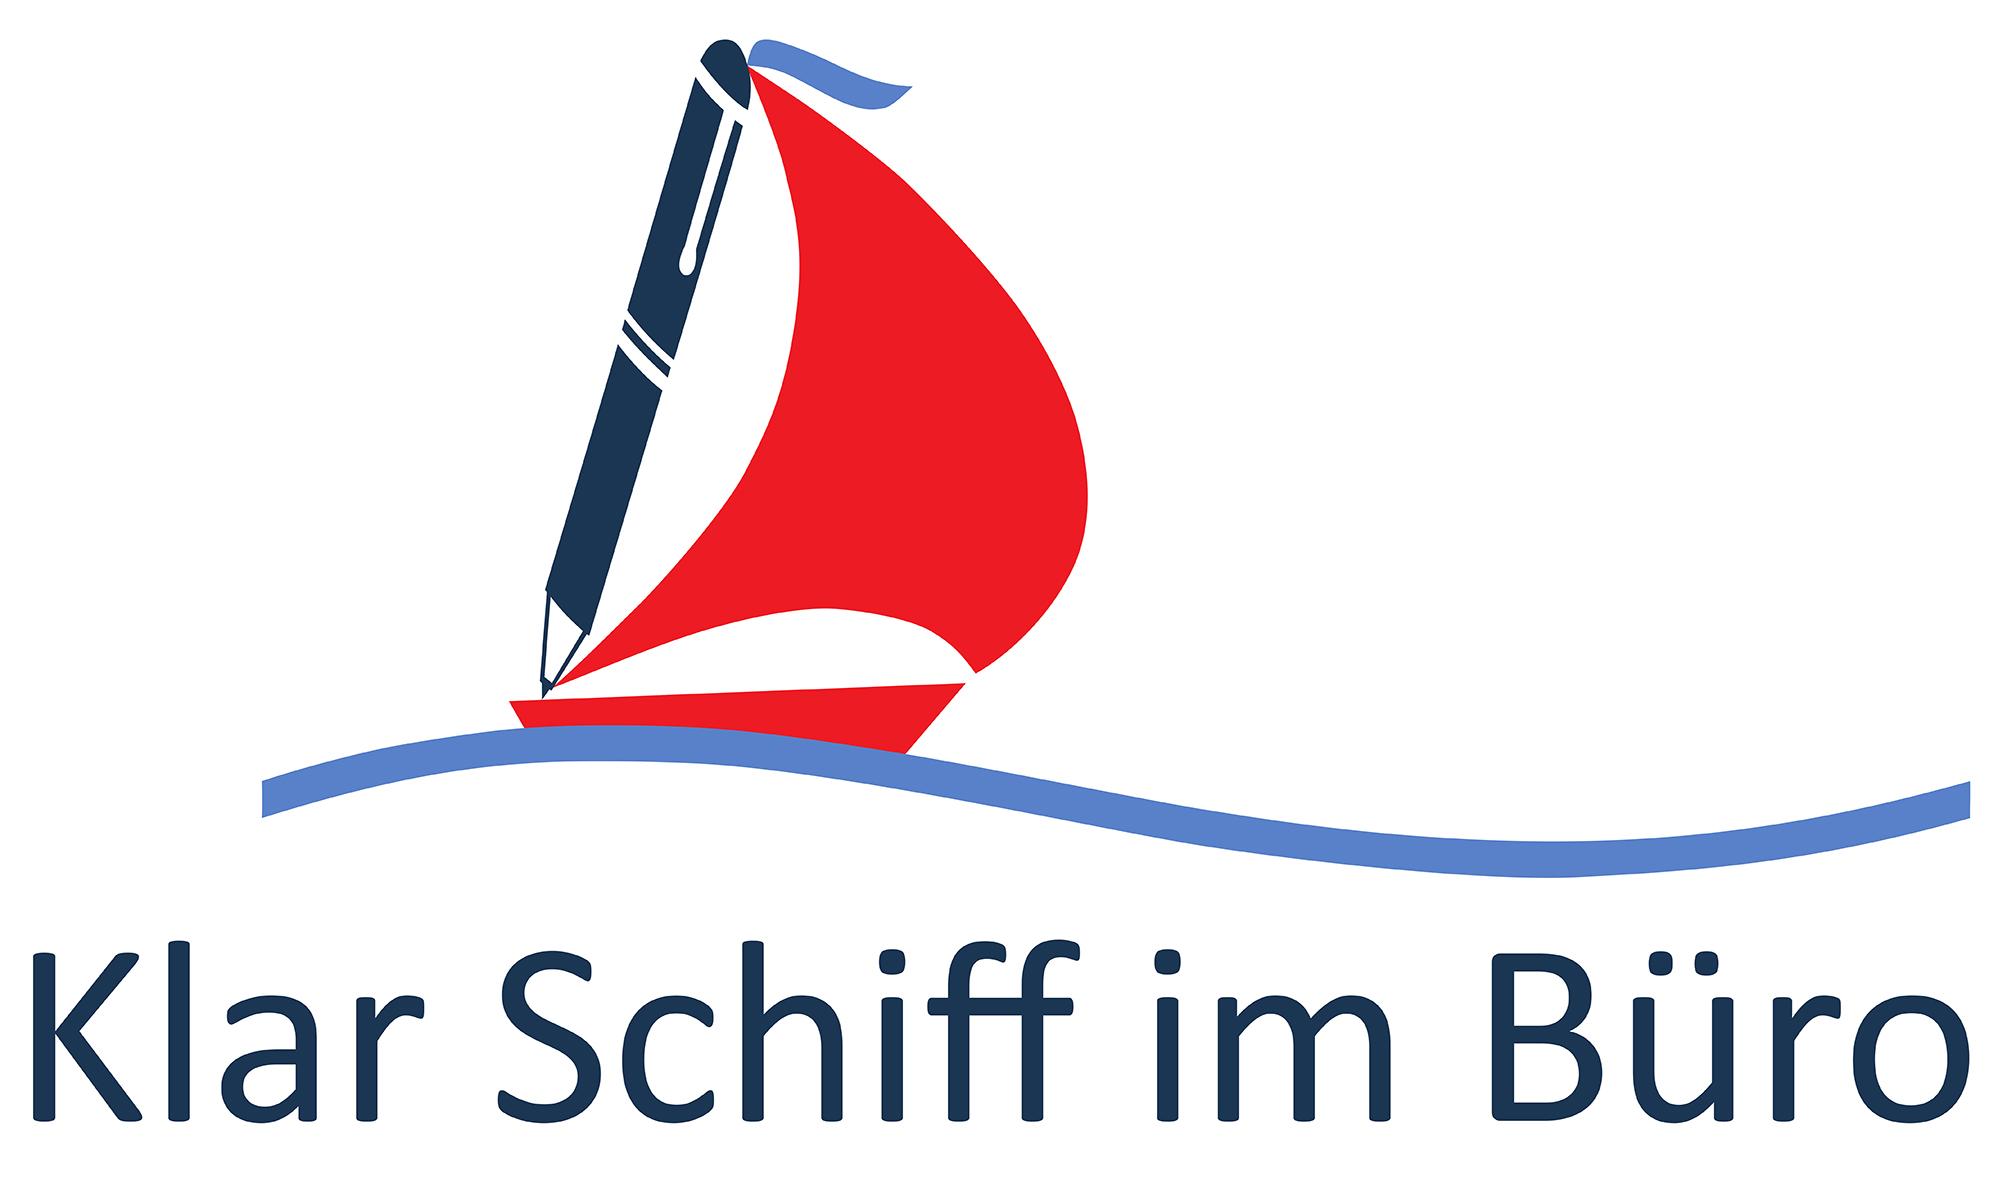 Klar Schiff im Buero